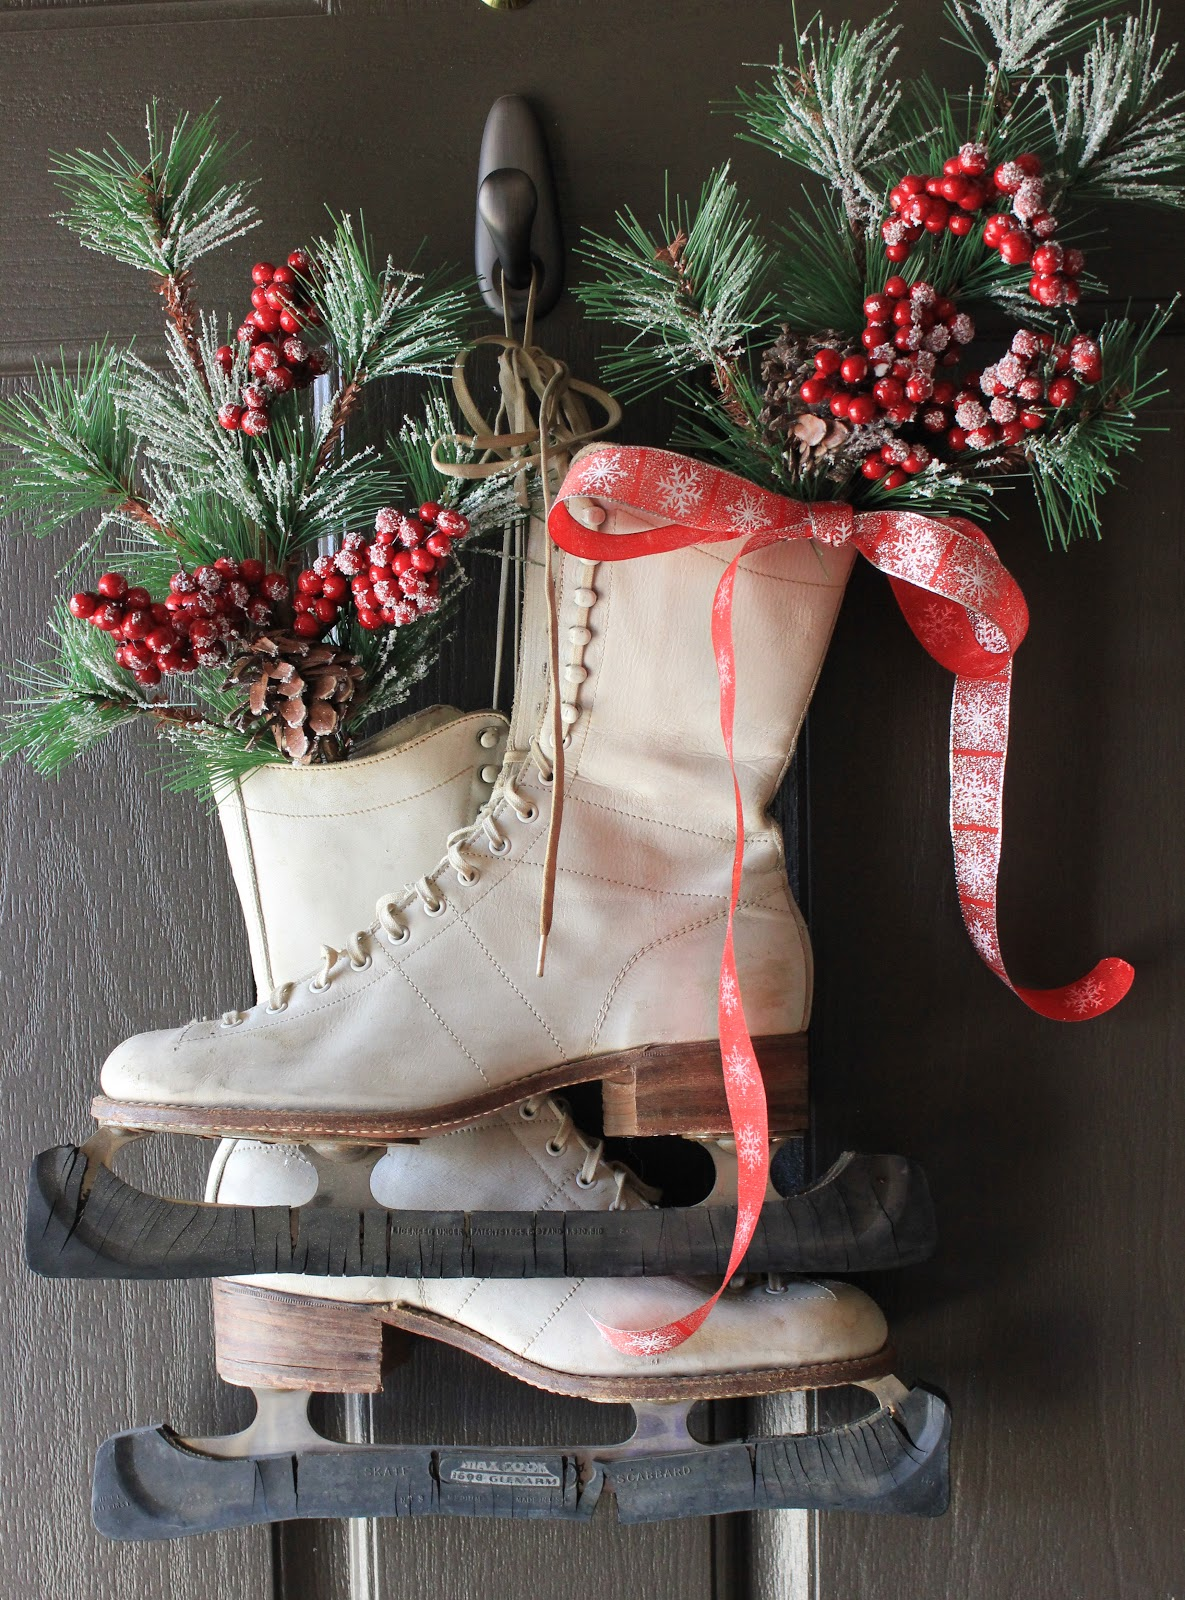 25 Handmade Christmas Decorations - The 36th AVENUE